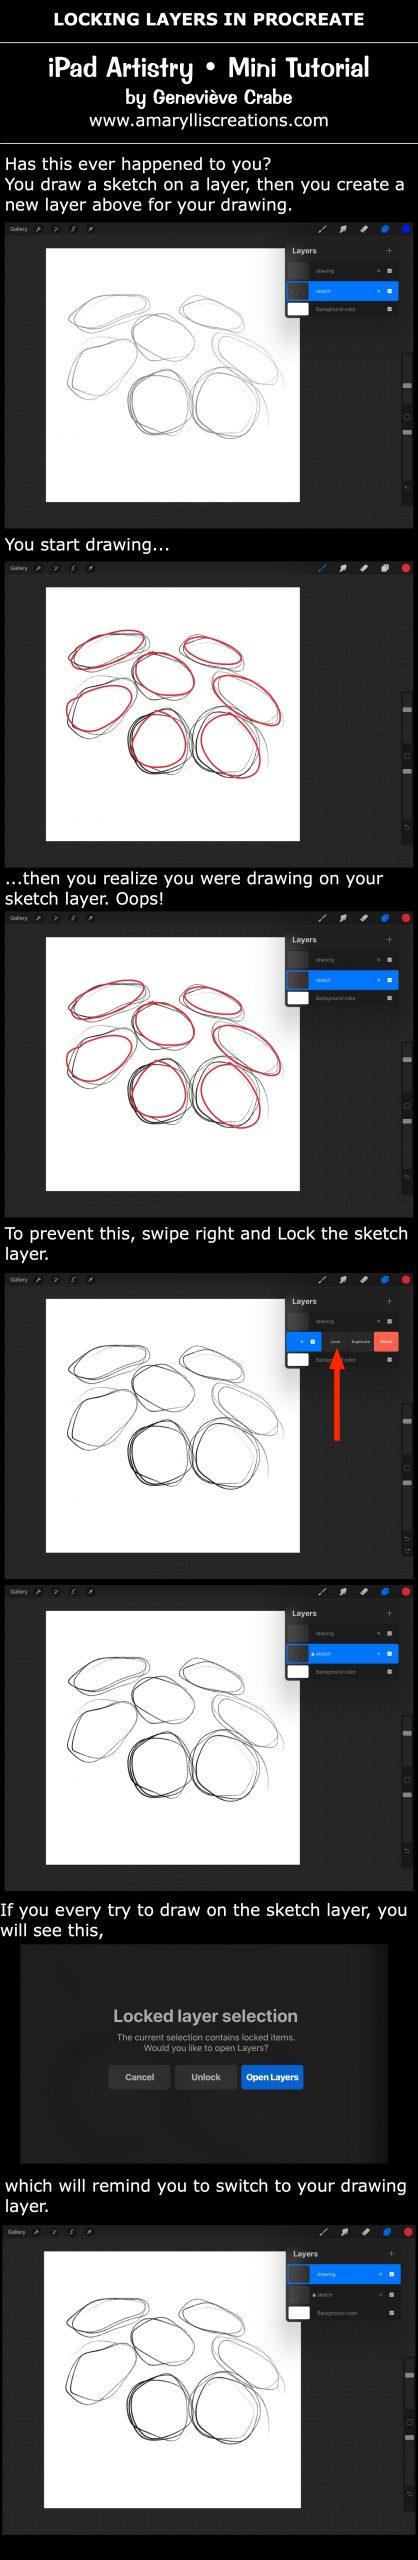 Mini Tutorial - Locking Layers in Procreate